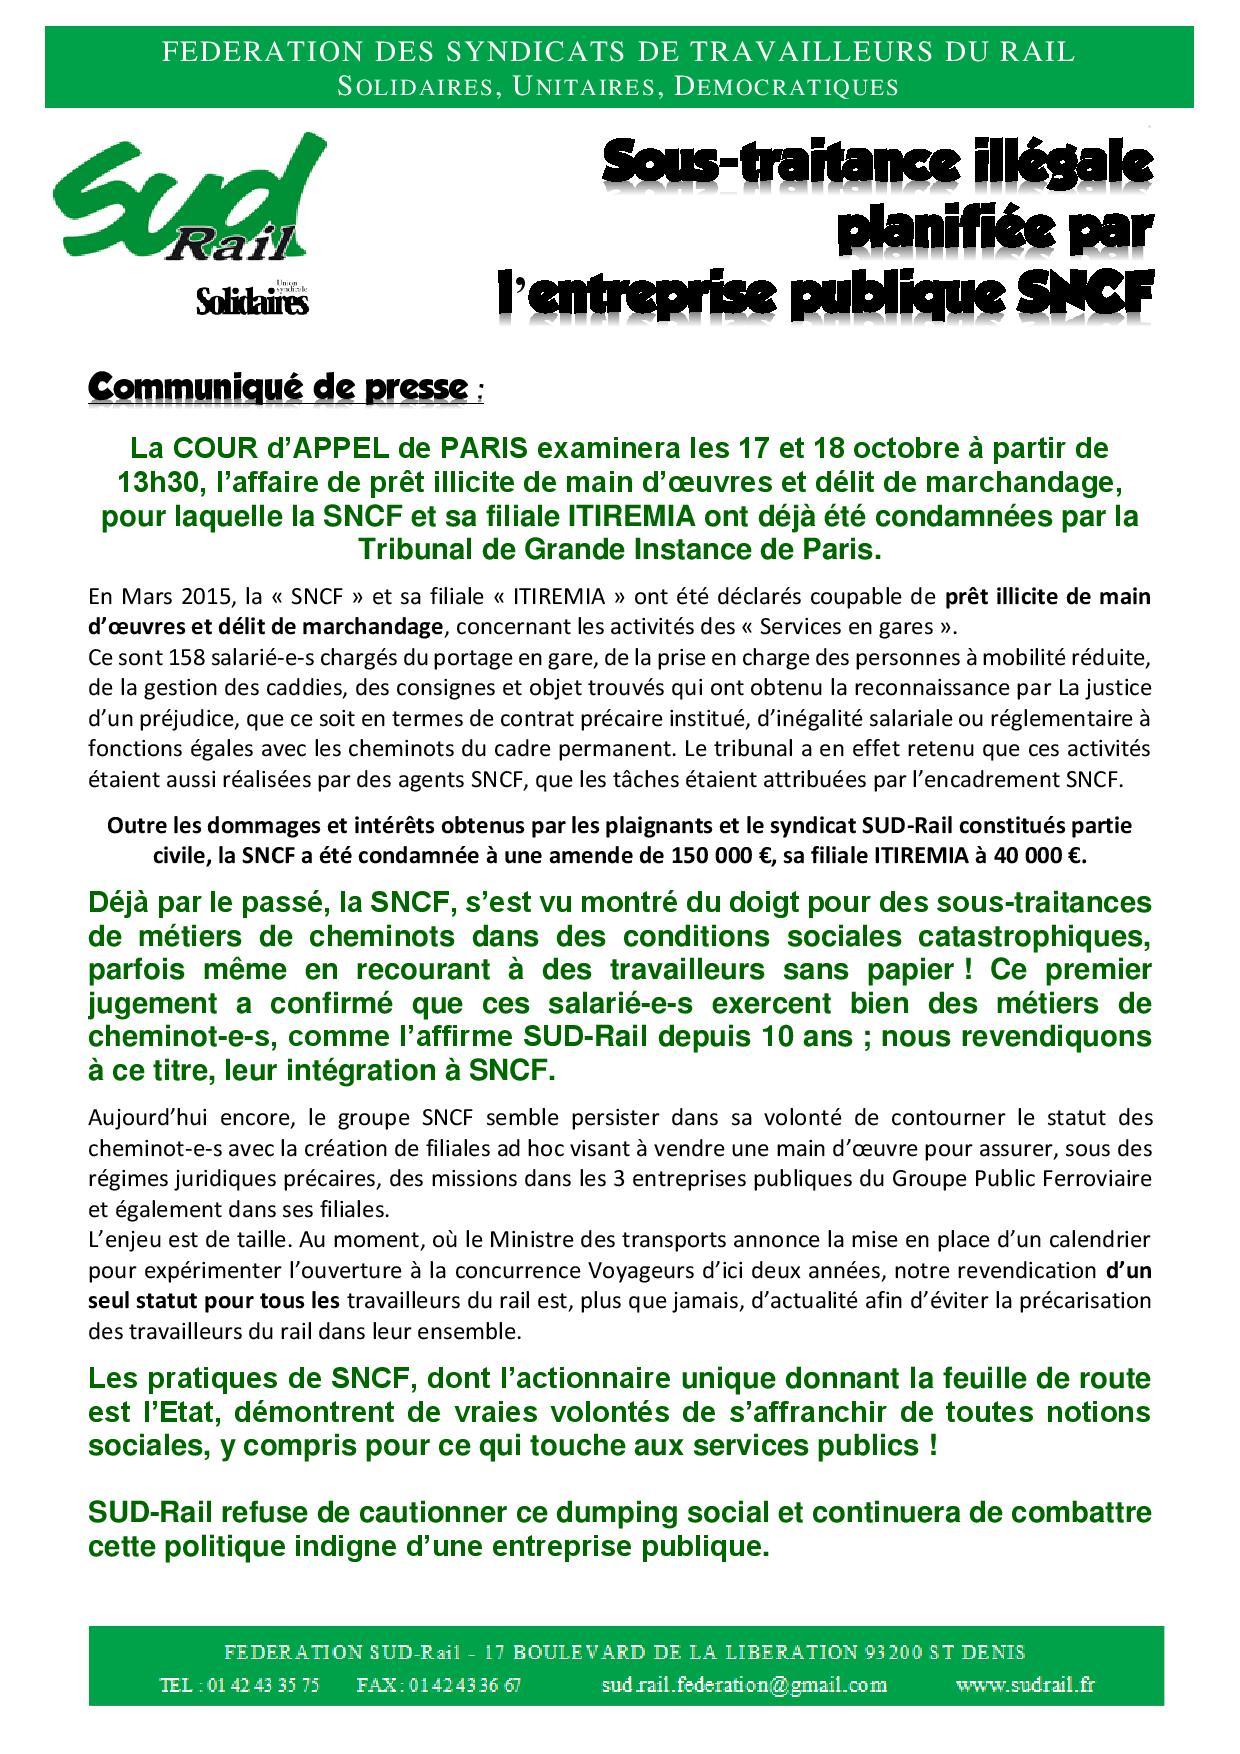 sncf-condamnee-sous-traitance-illegale-10-2016-page-001